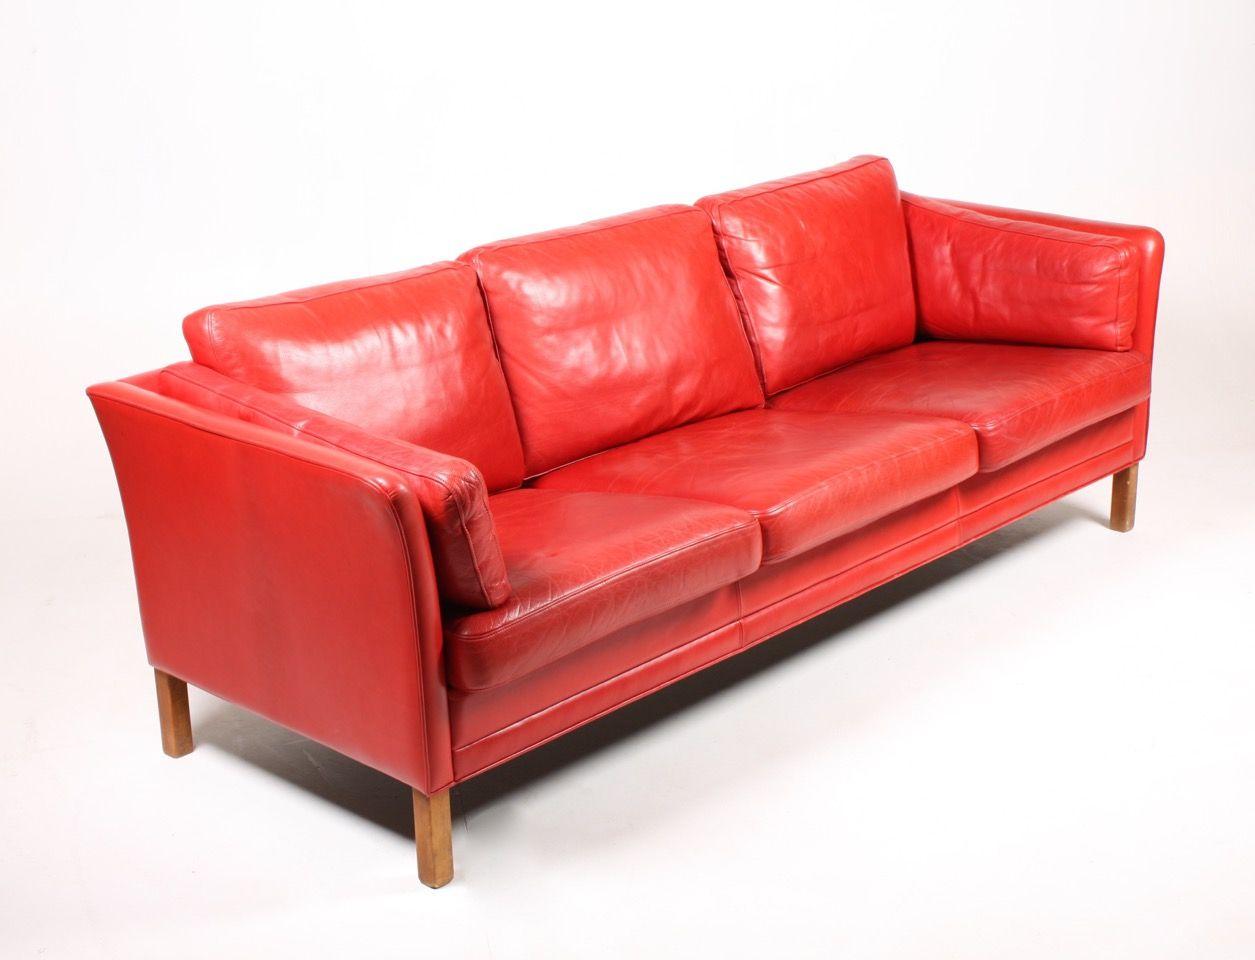 d nisches rotes vintage drei sitzer ledersofa von mogens. Black Bedroom Furniture Sets. Home Design Ideas